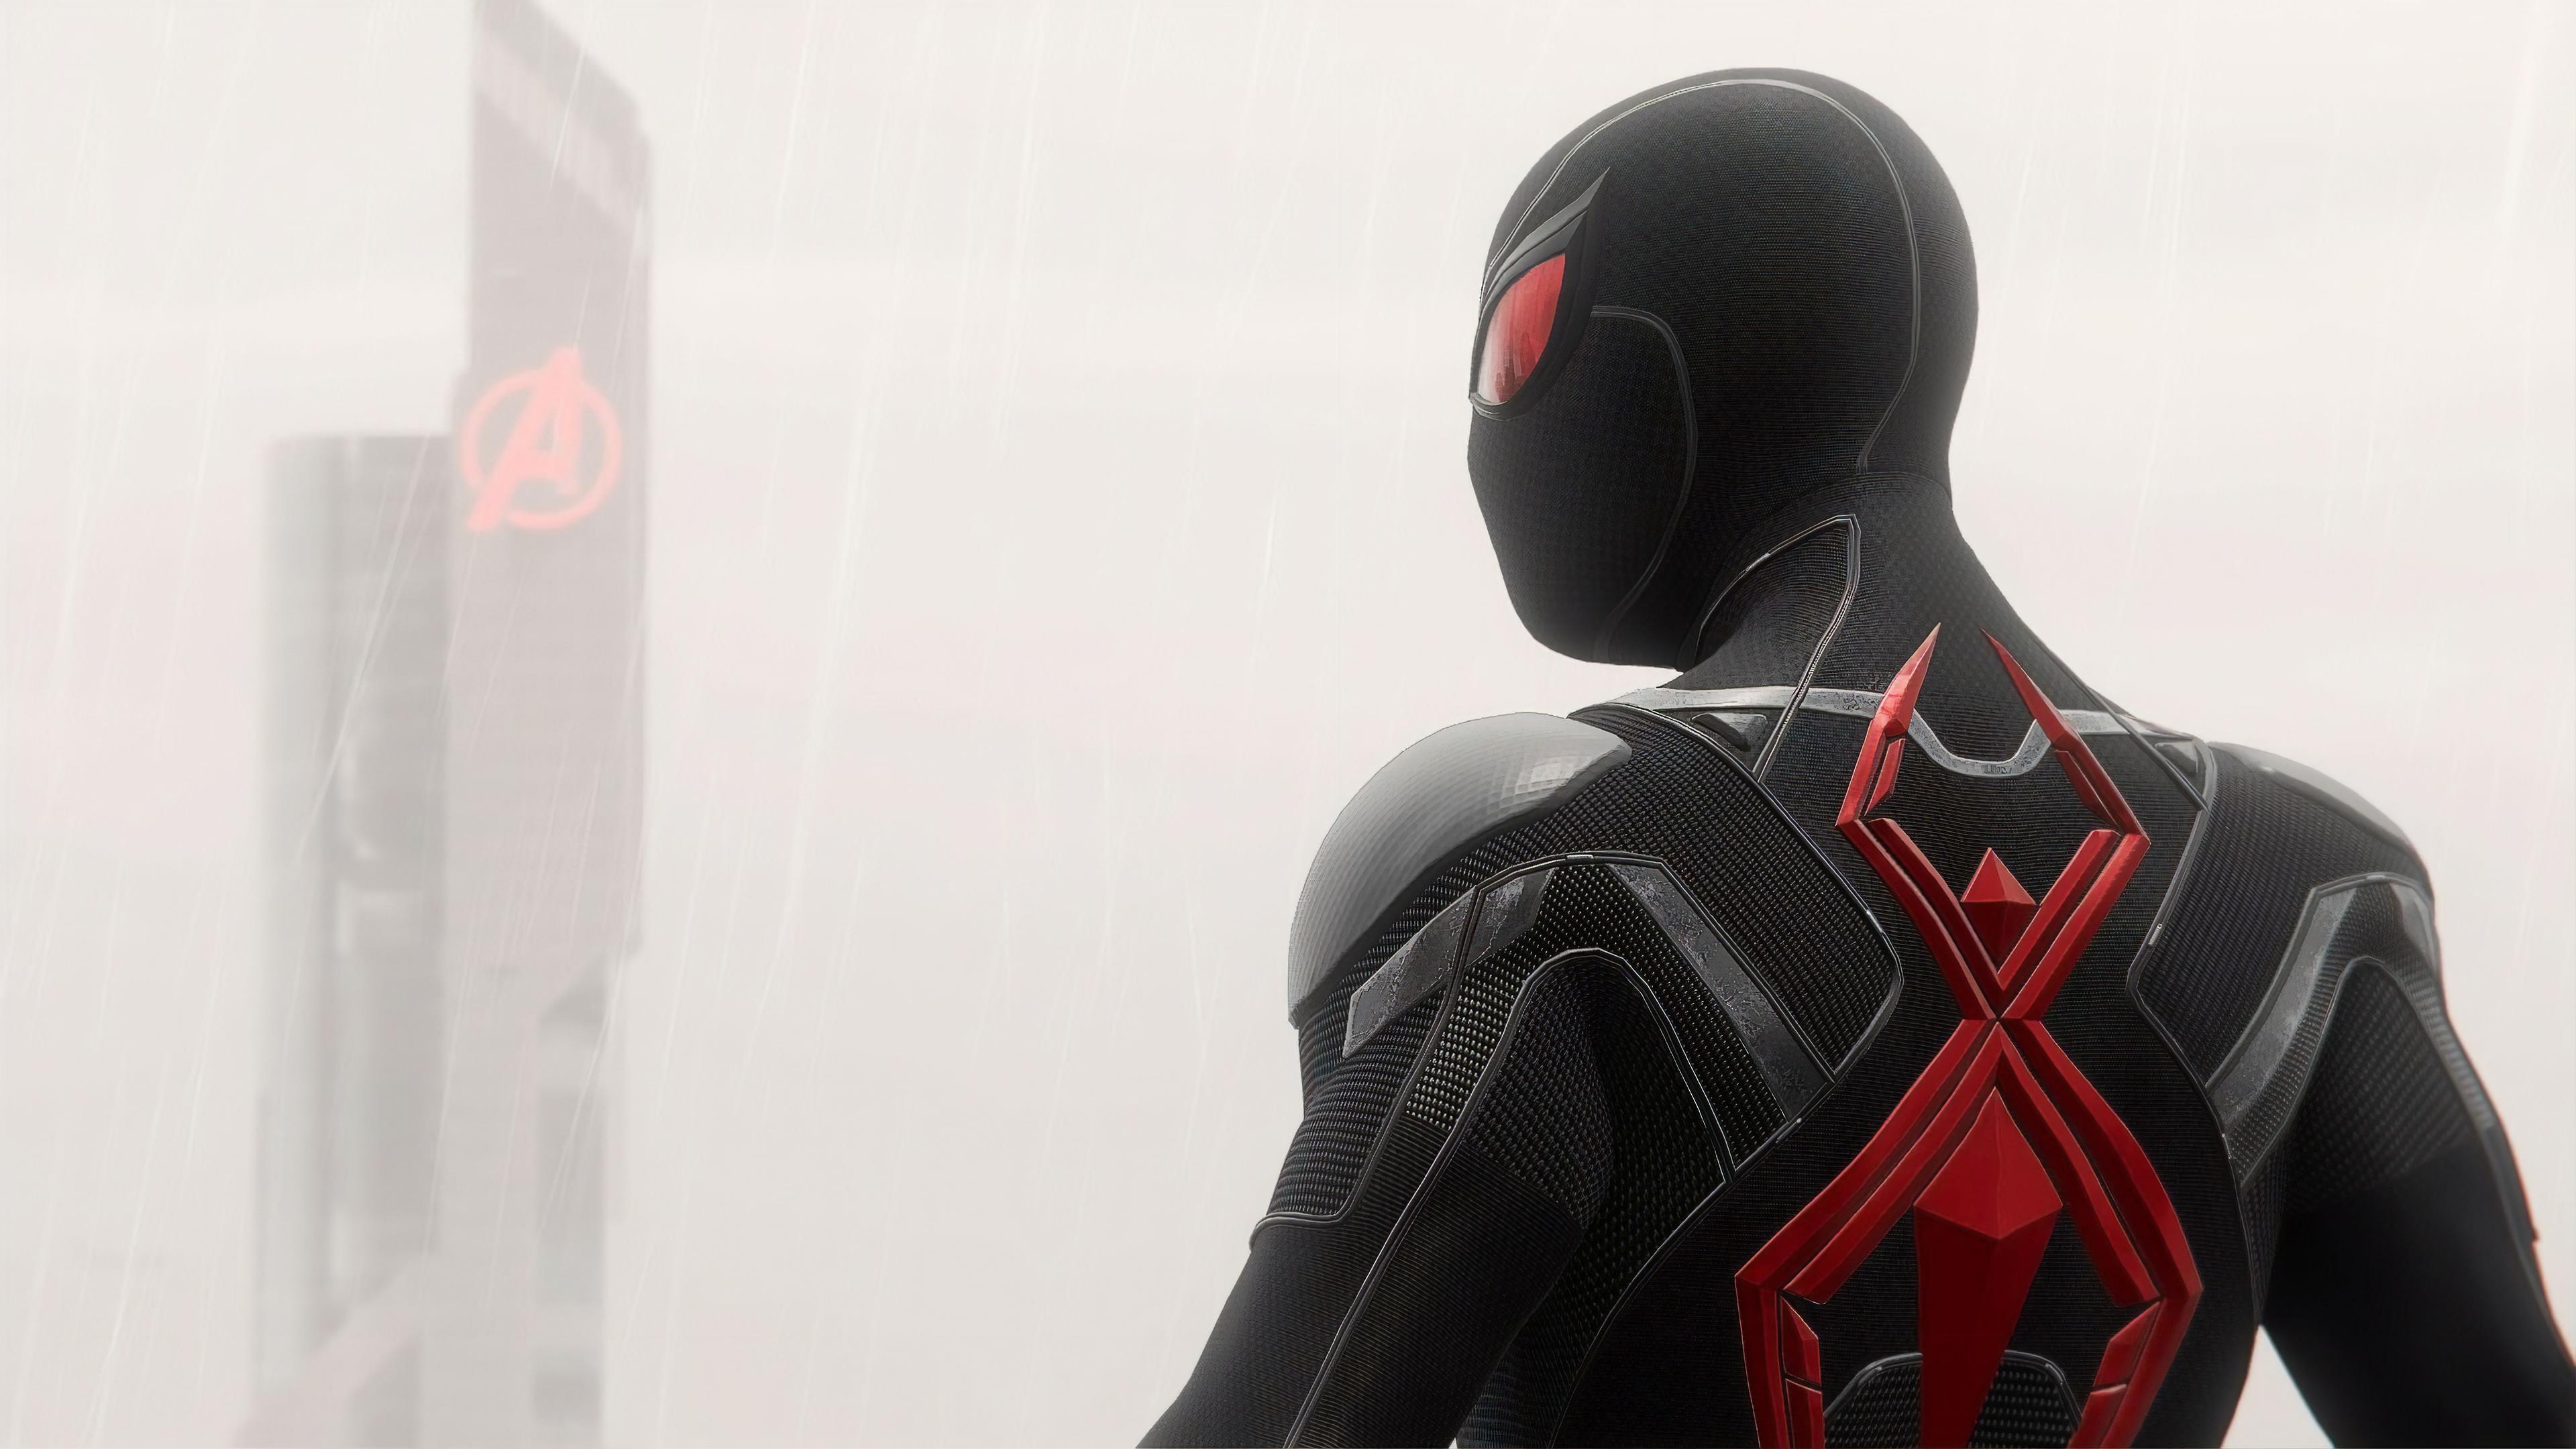 Wallpaper 4k Spiderman Black And Red Suit 4k 2019 Games